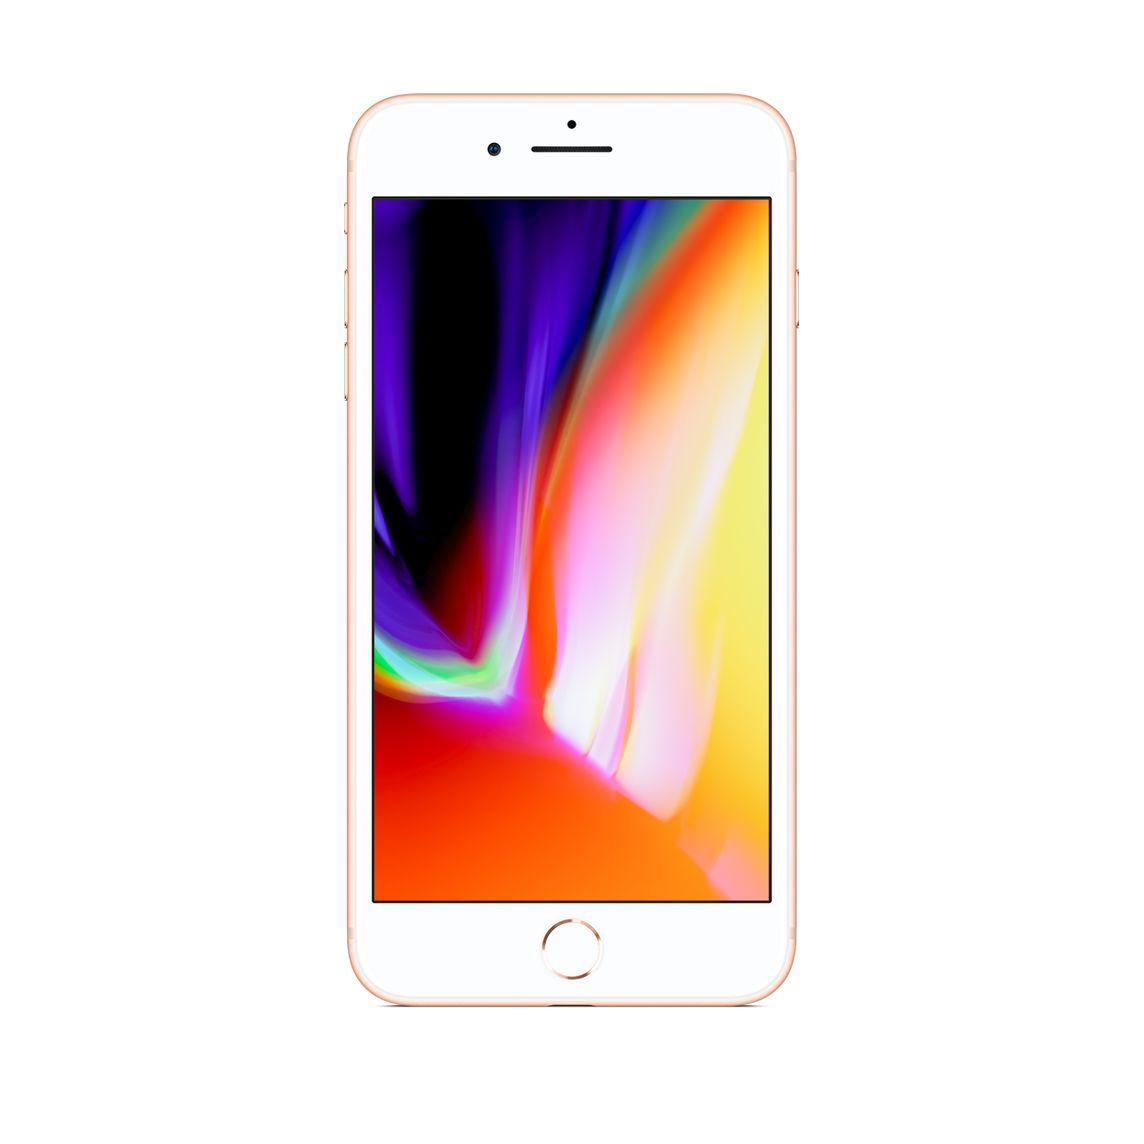 Refurbished Iphone 8 Plus 64gb Gold Unlocked Apple